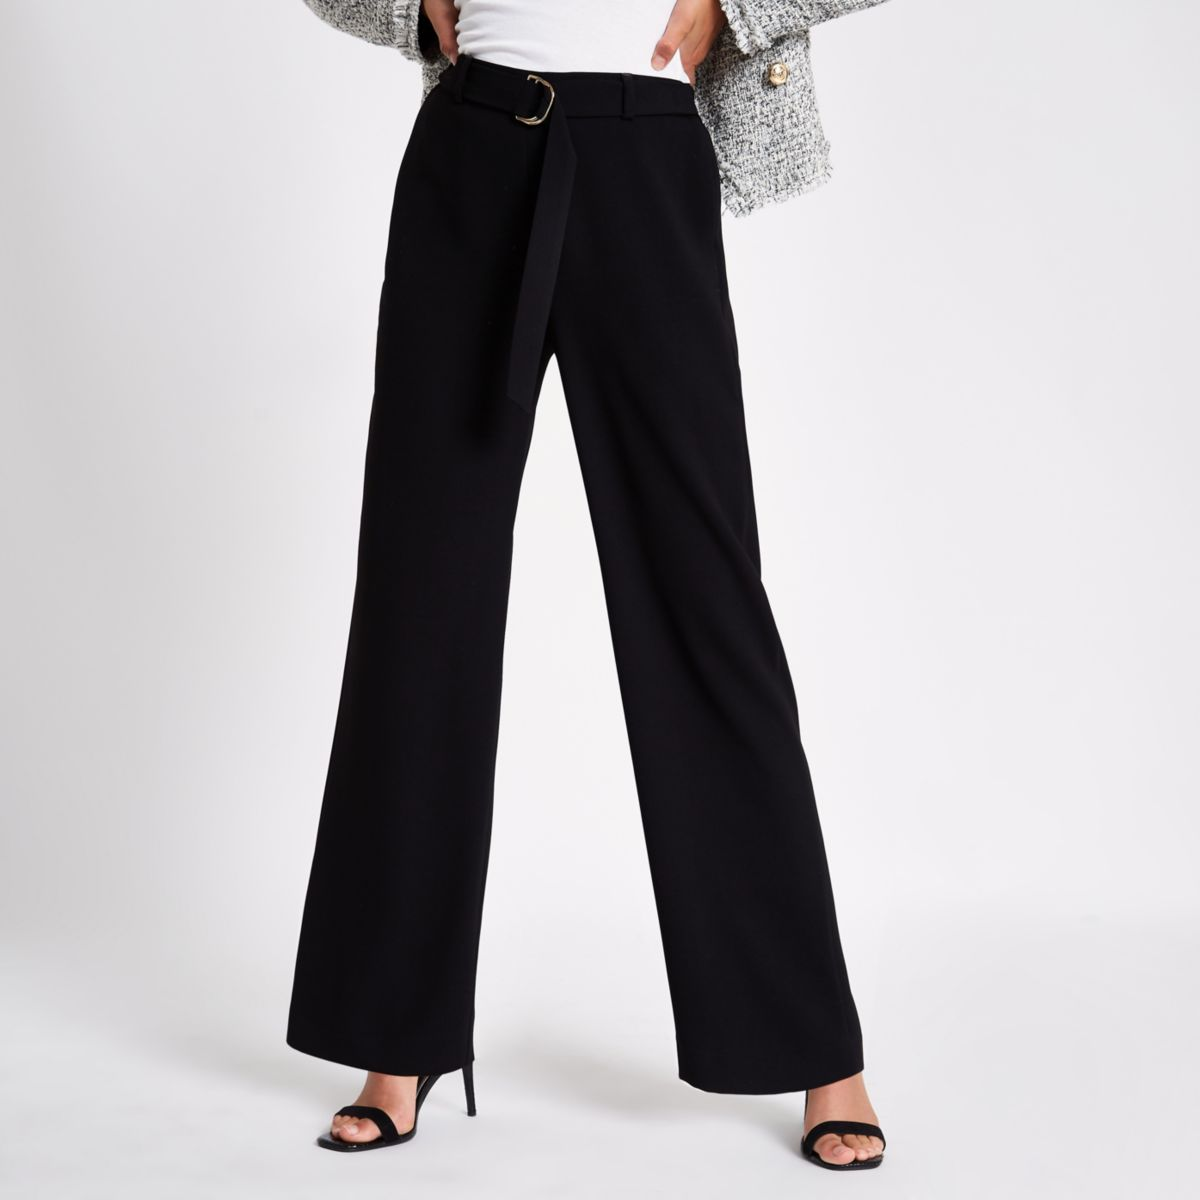 Black slim wide leg belted pants